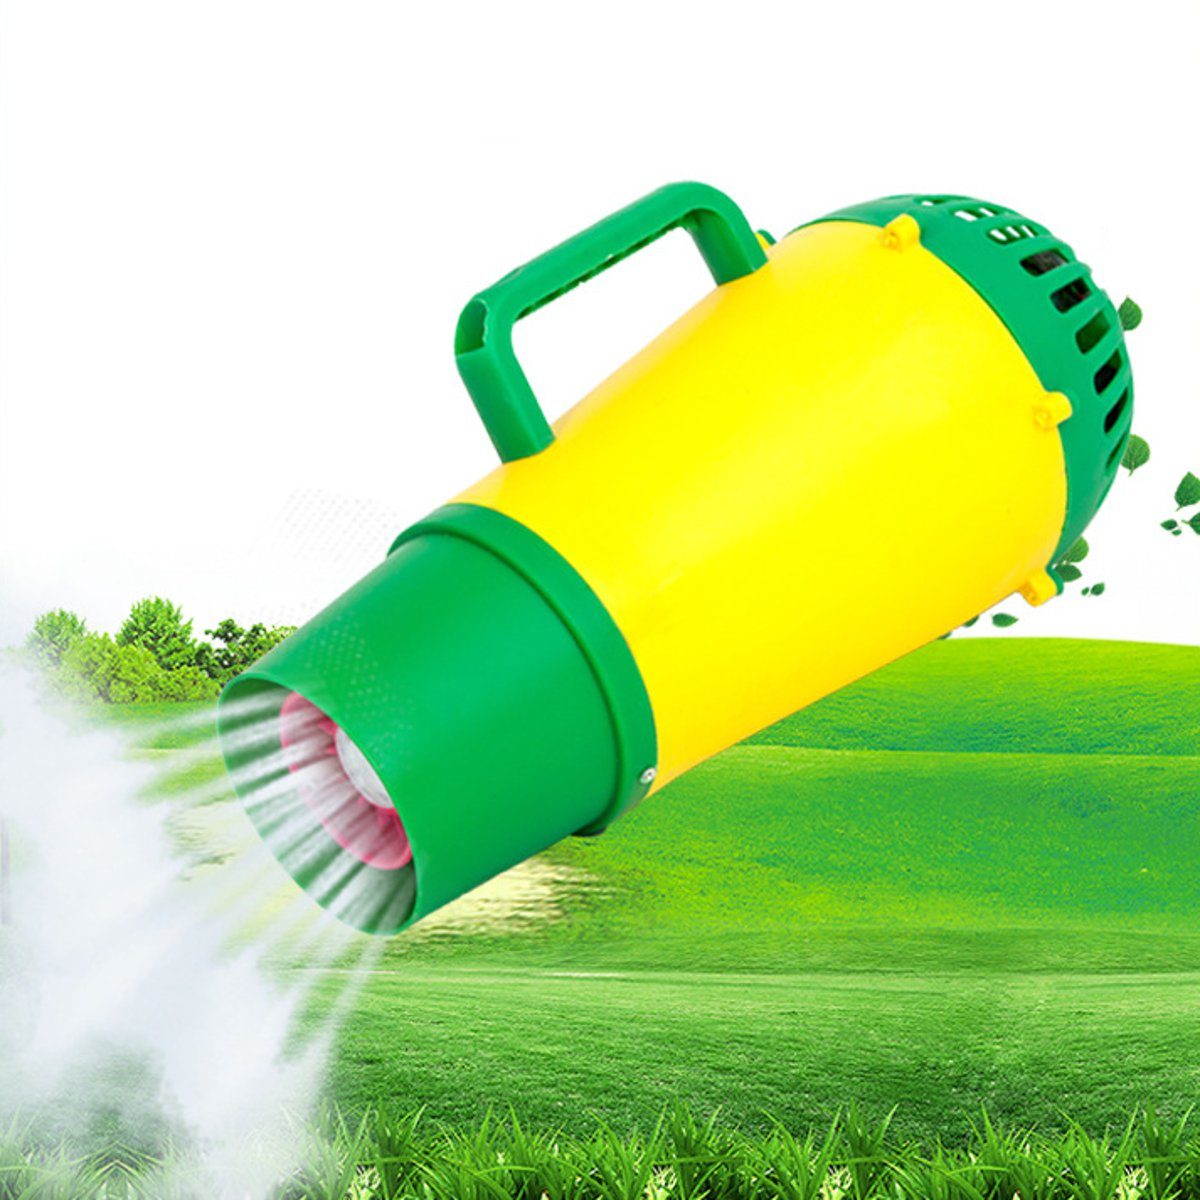 Electric Sprayer Blower Portable Handheld Garden Sprayer Blower Agriculture Pest Control Killer Garden Farm Irrigation Tool